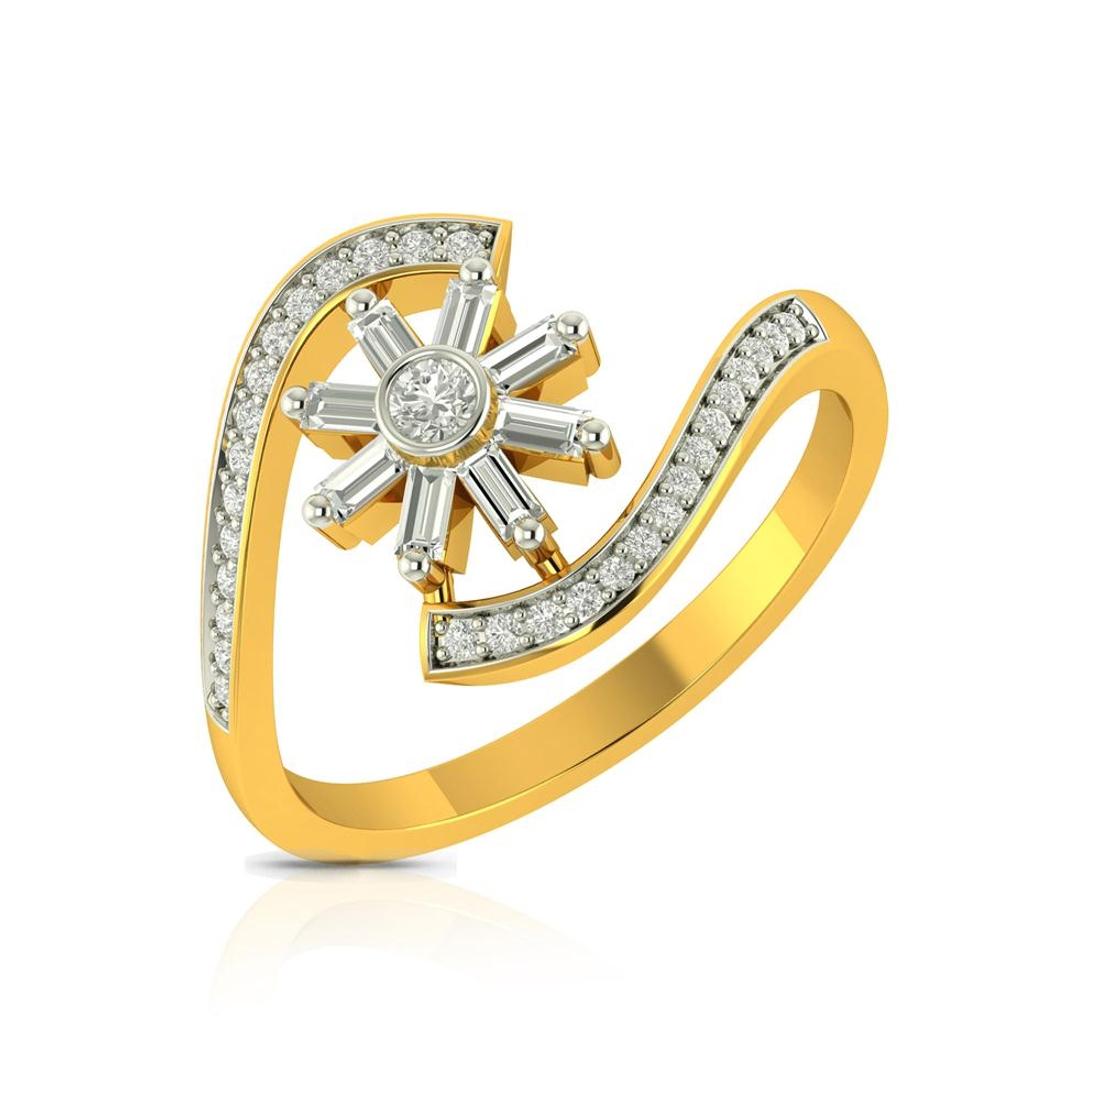 Buy Charu Jewels Diamond Ladies Ring CJLR0106 Online in India